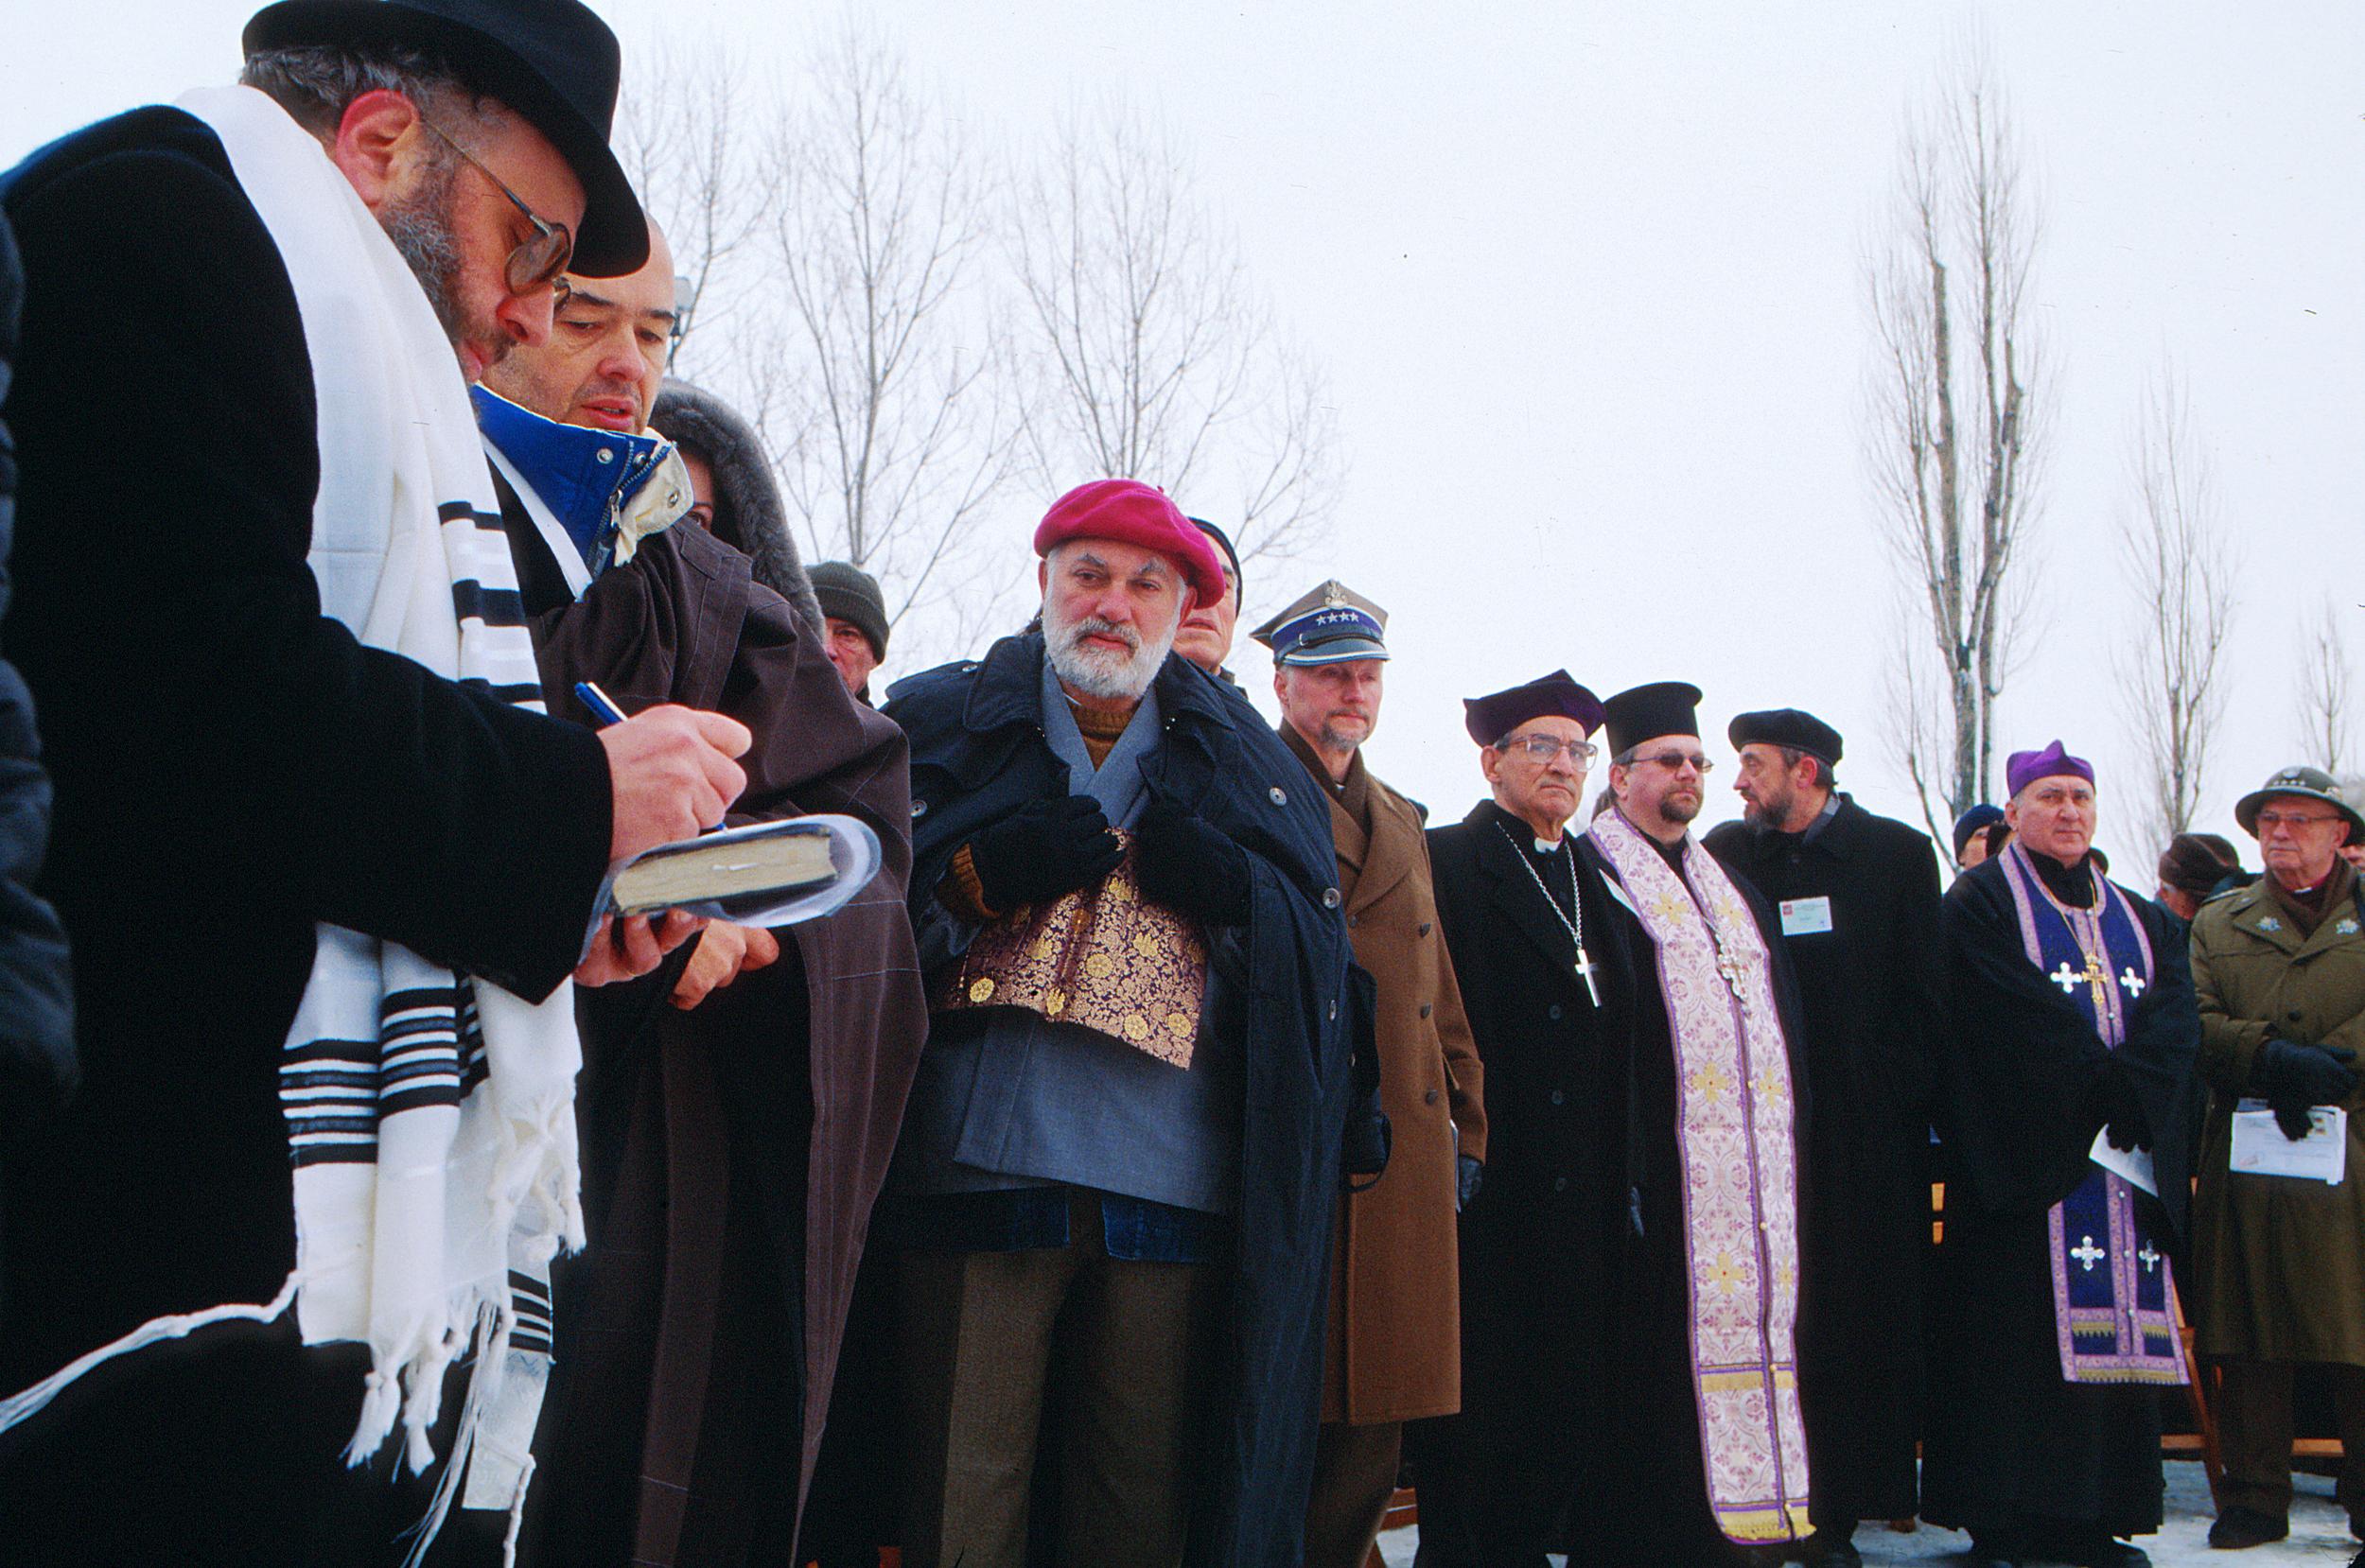 An interfaith ceremony in Birkenau January 2005